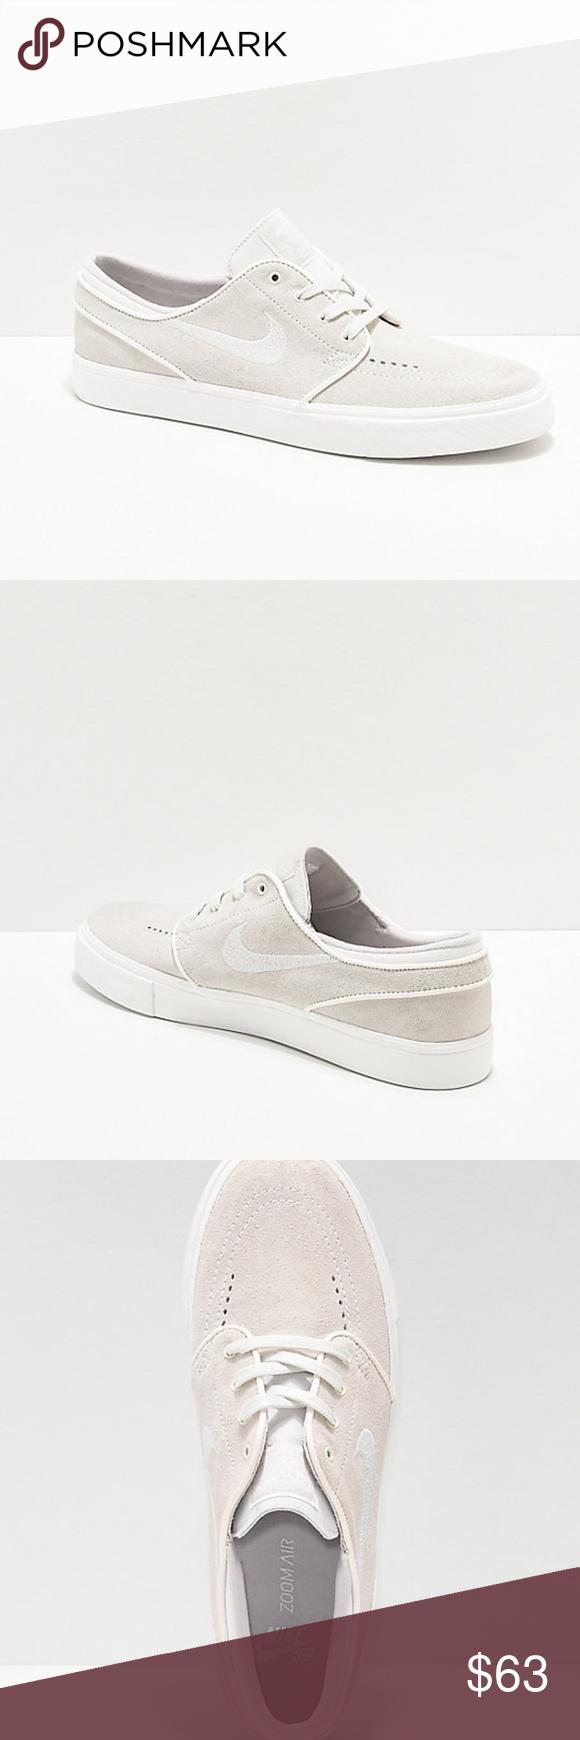 Nike sb janoski, Suede skate shoes, Nike sb